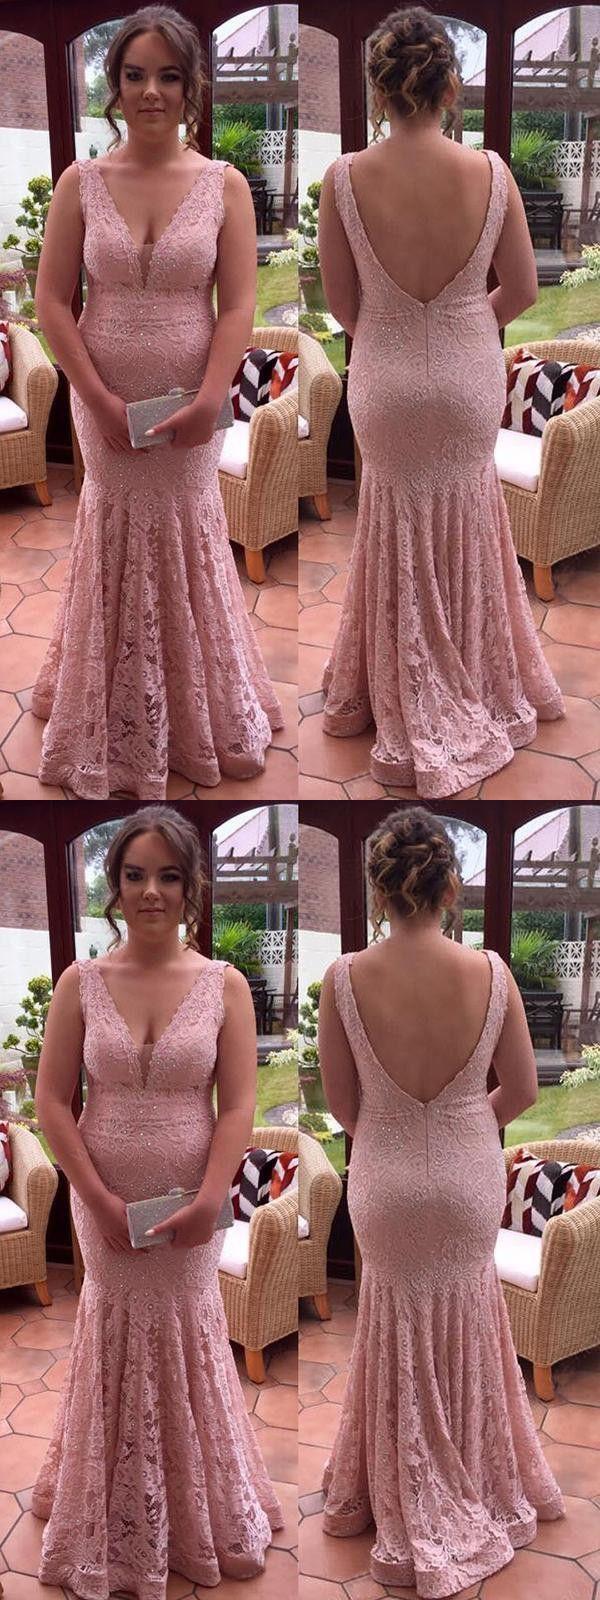 Plus sinze mermaid prom dress lace pink prom dress er in